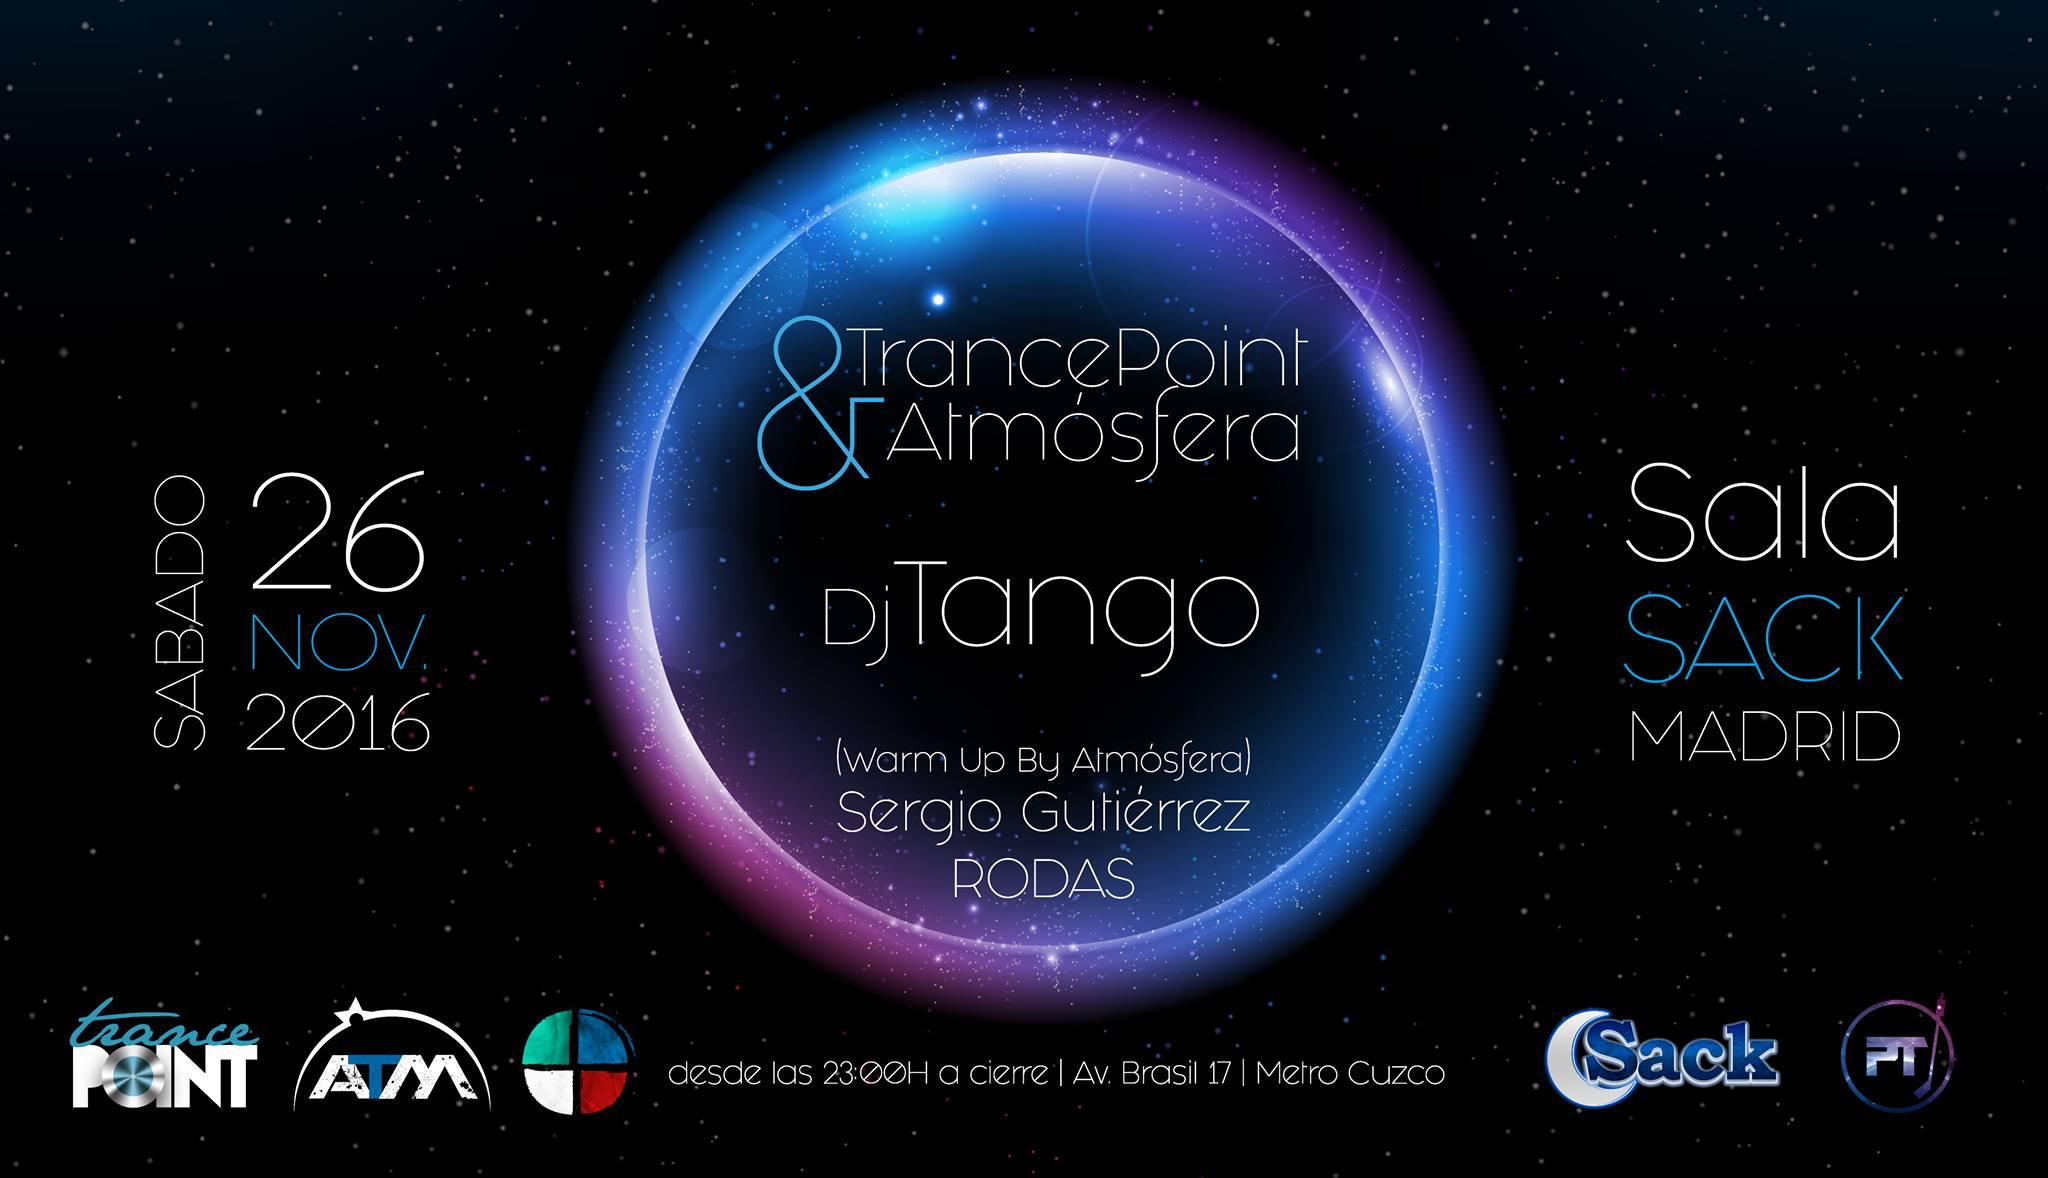 26 de noviembre: Dj Tango en Trance Point